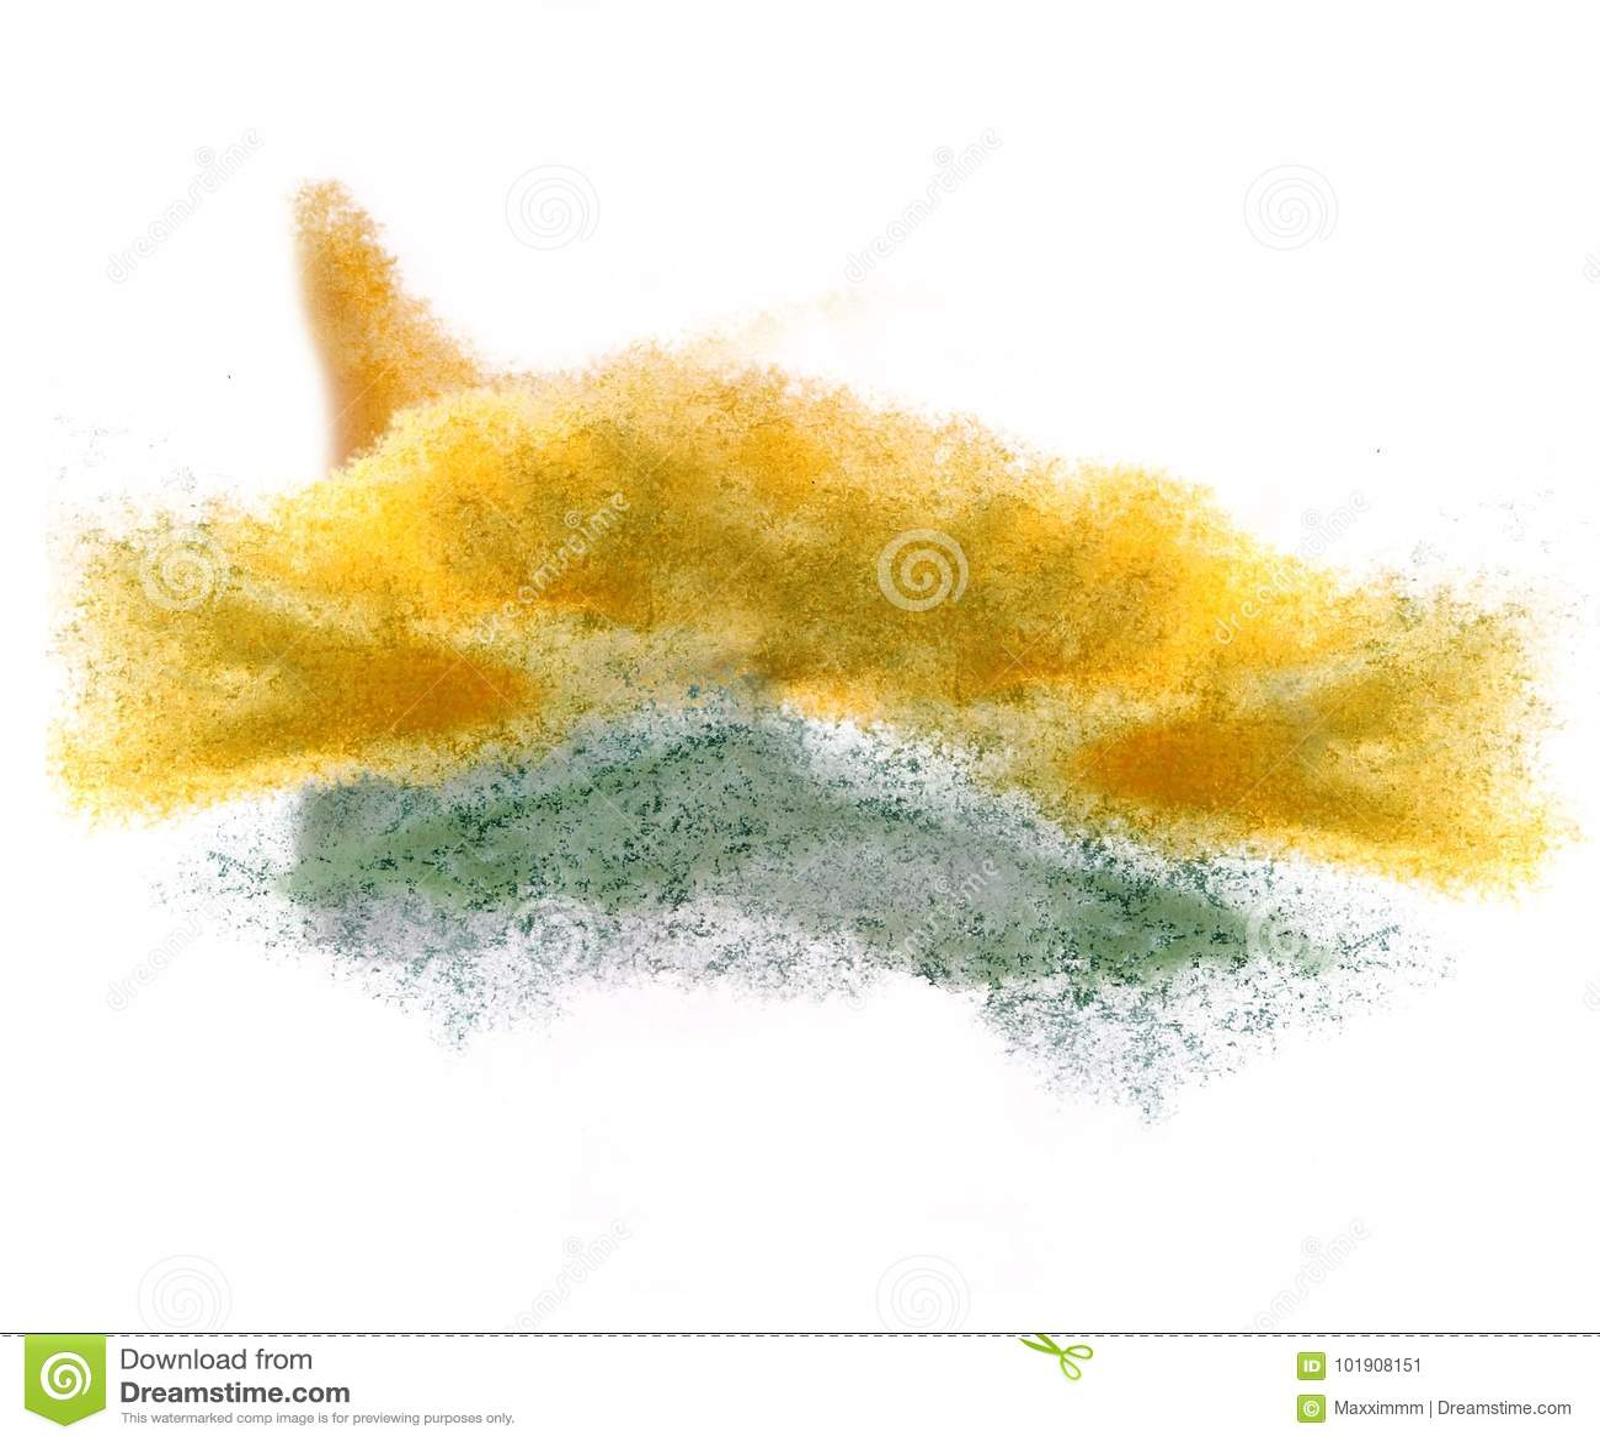 Art watercolor ink paint blob watercolour yellow, green splash